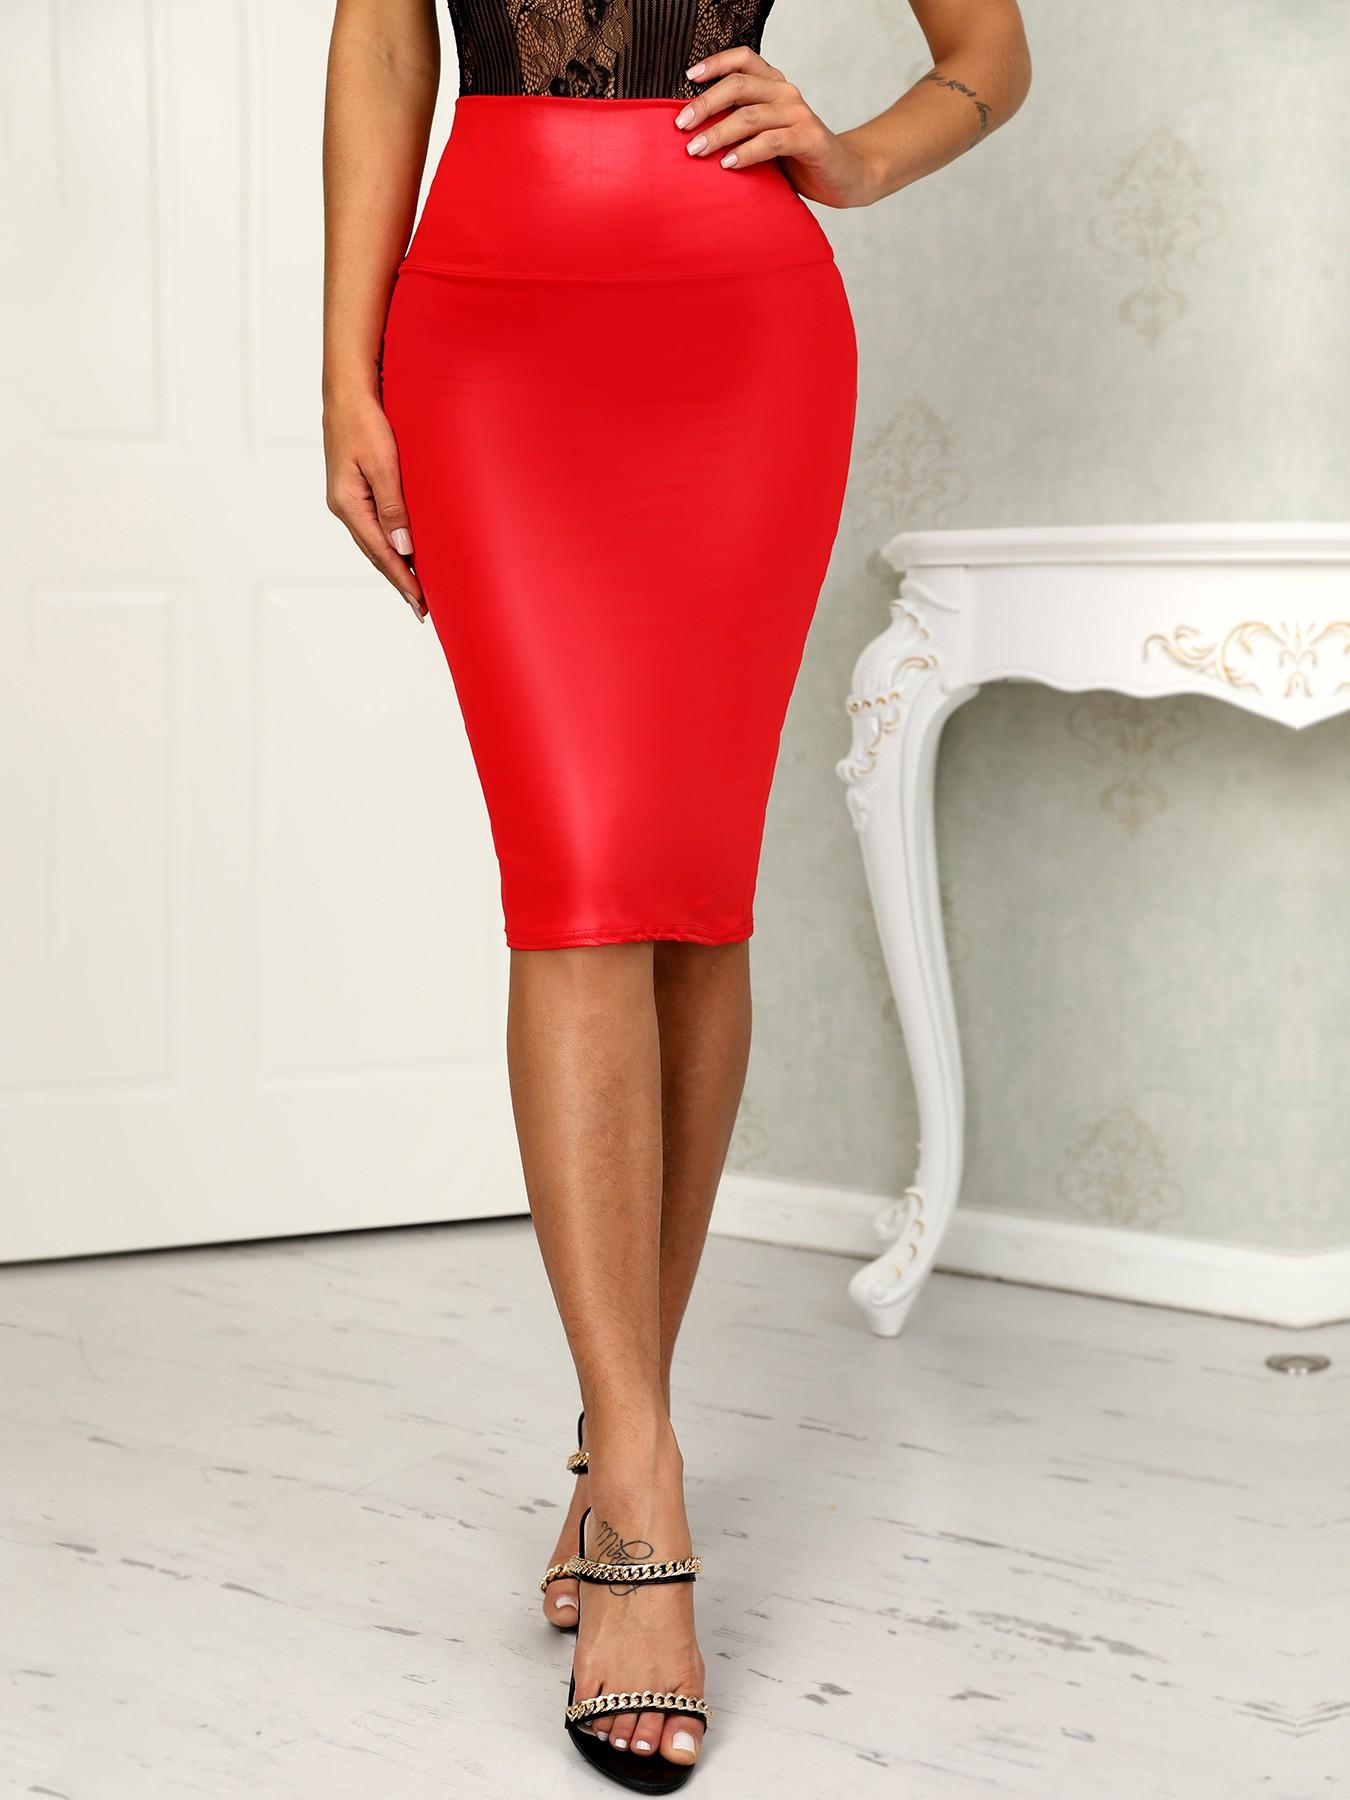 boutiquefeel / OL Style PU High Waist Slinky Skirts